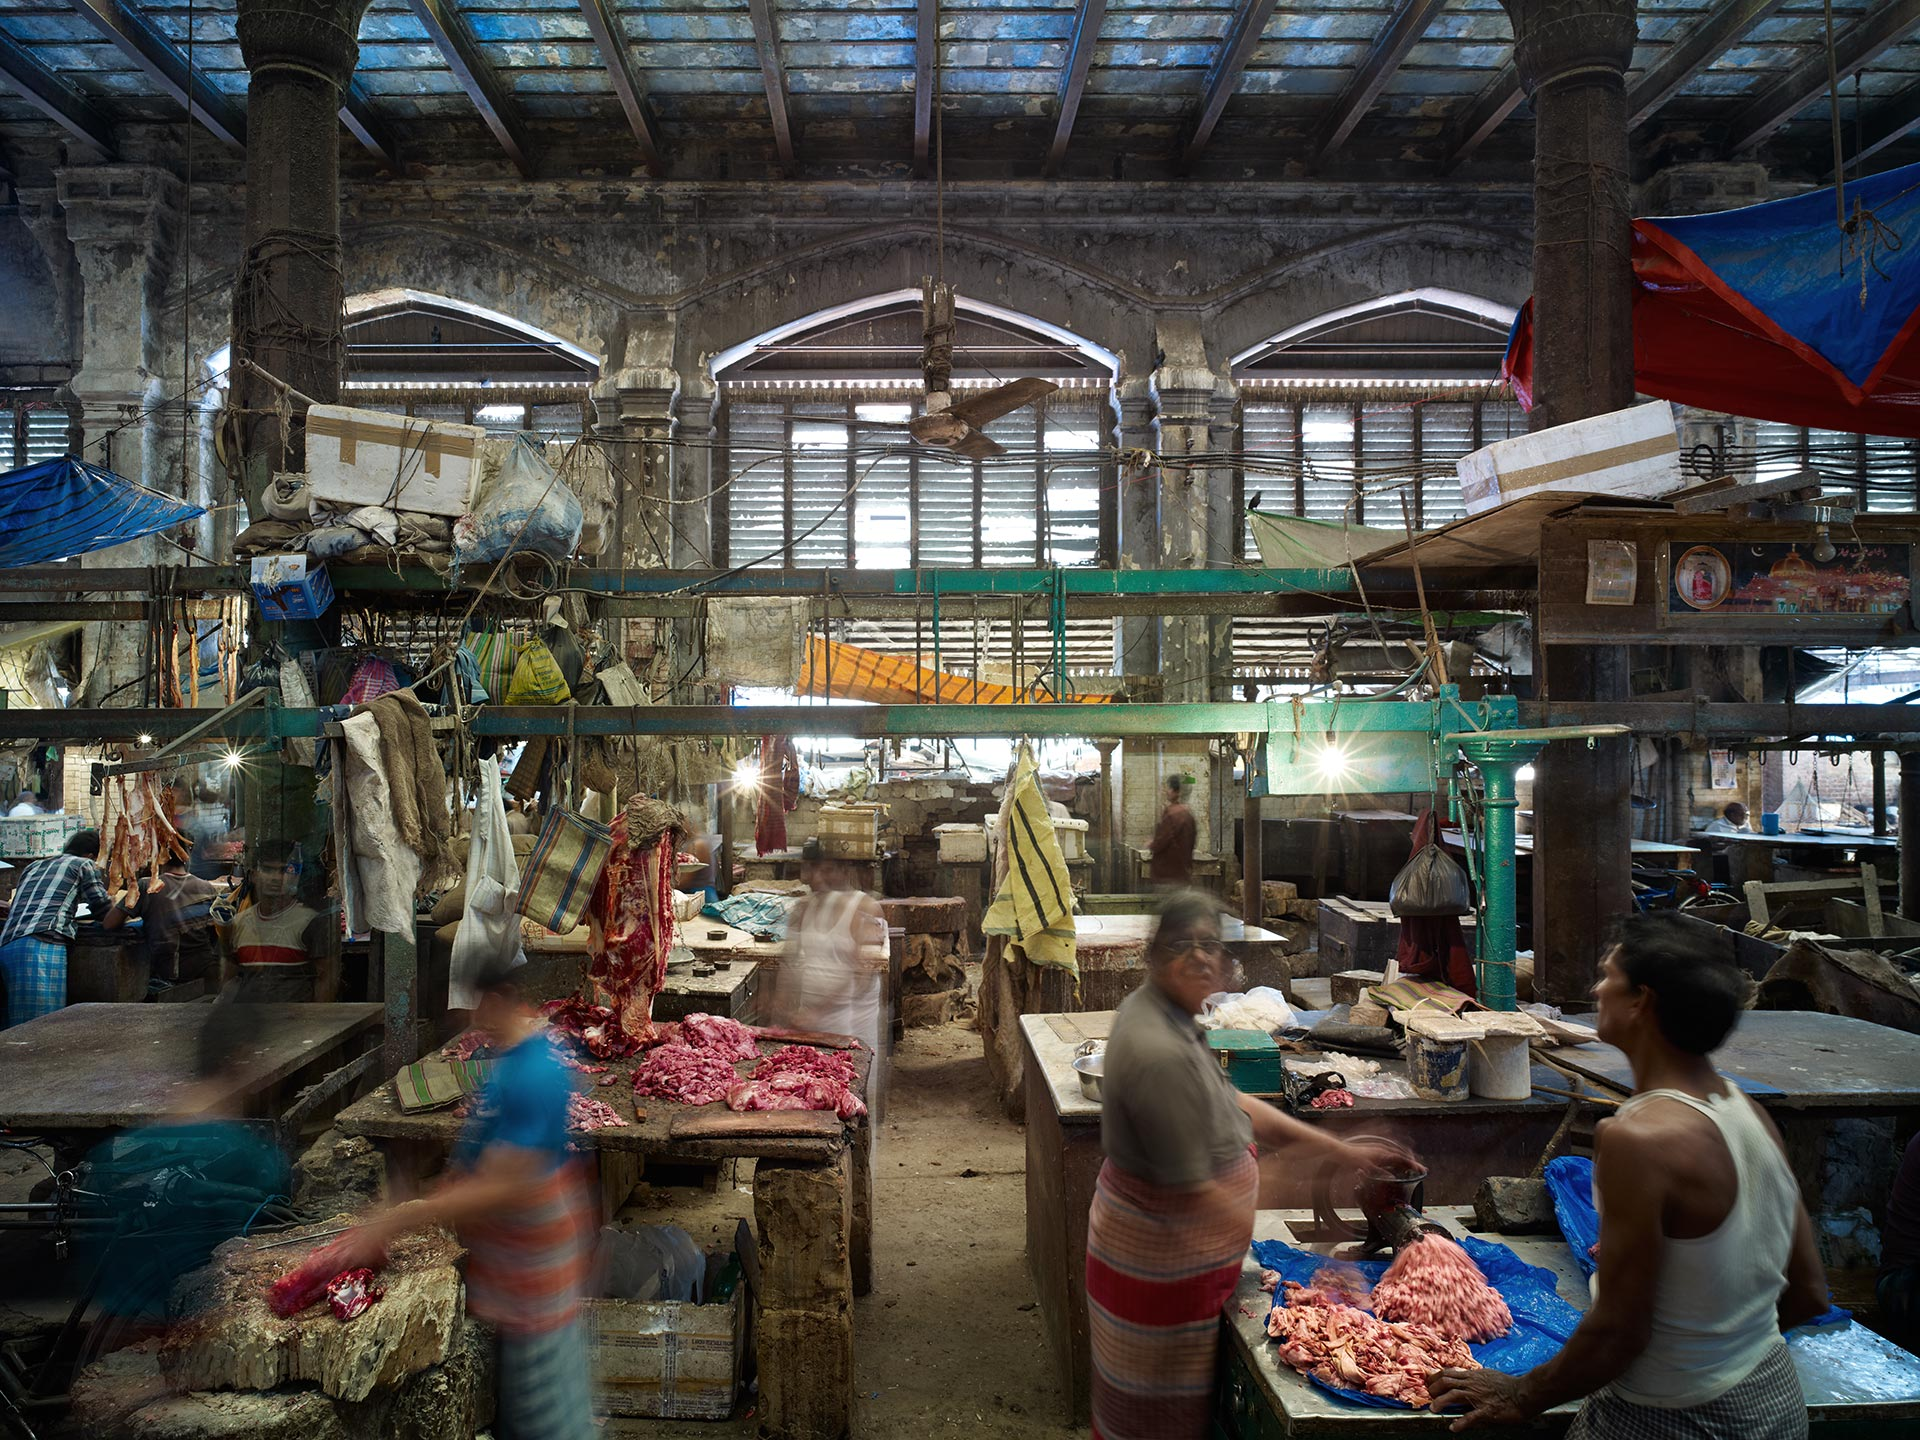 Hogg-Street-Market-#2,-Kolkata,-India---2013.jpg